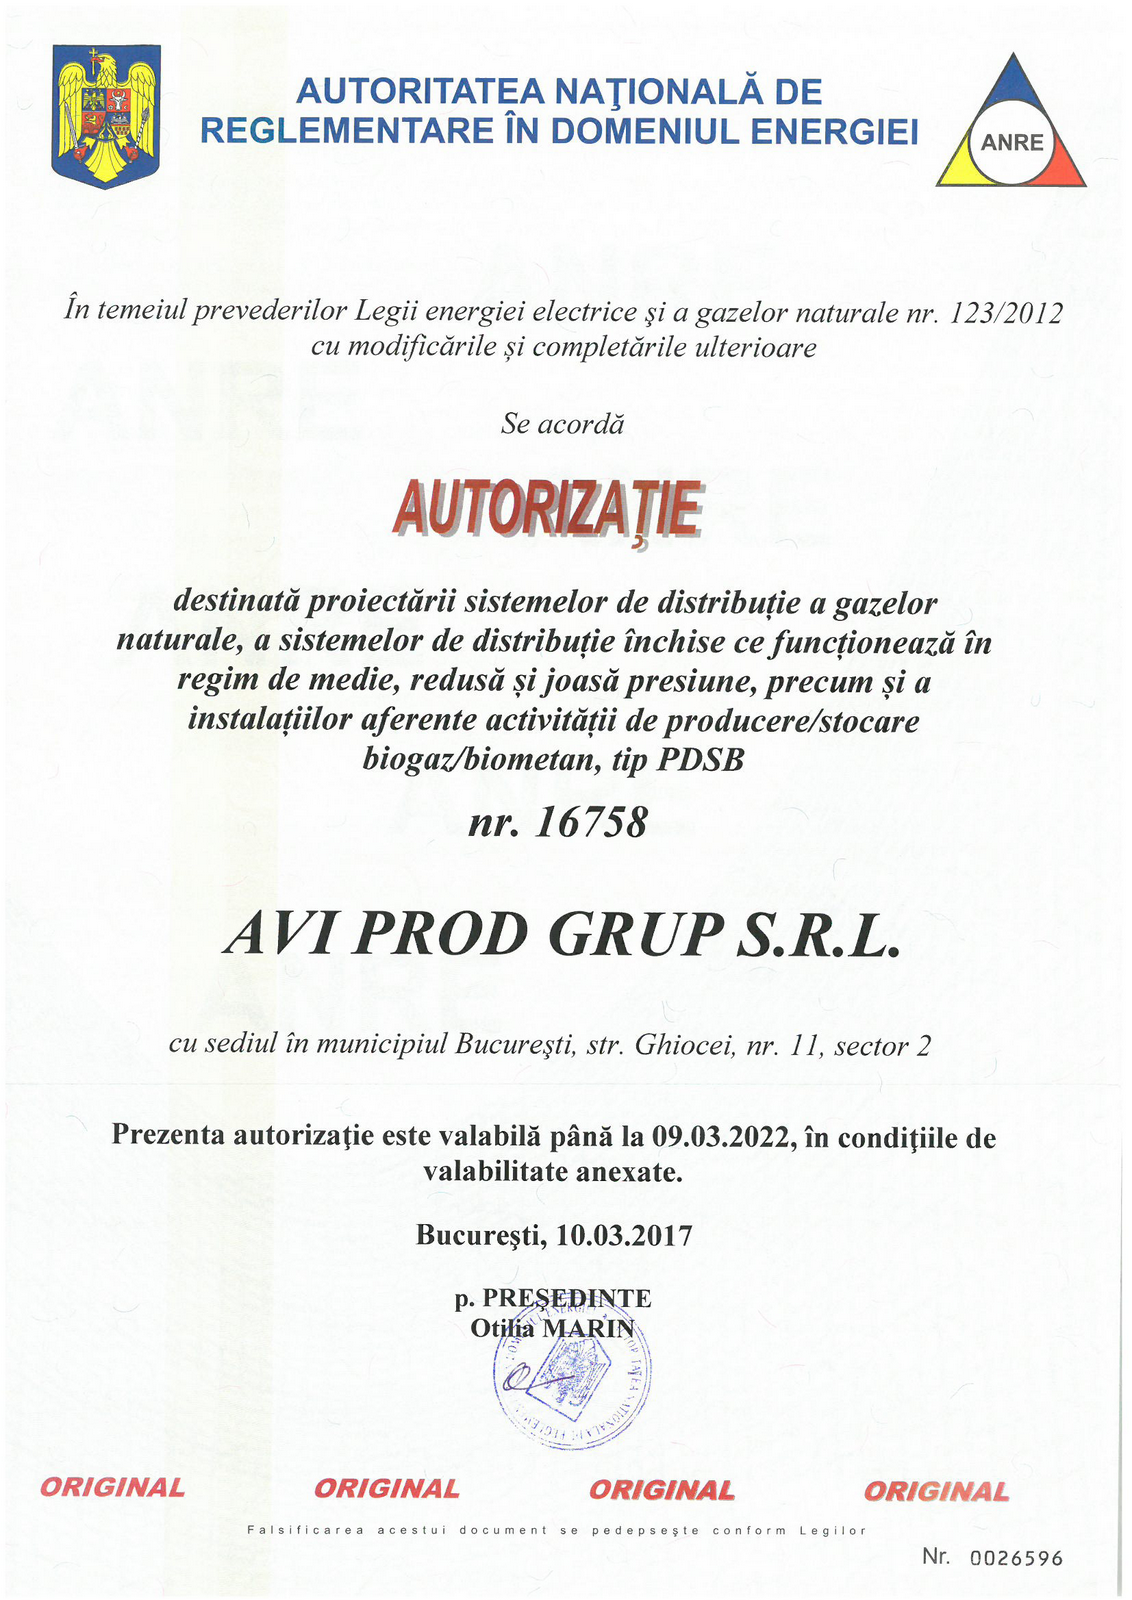 AUTORIZATIIPPI_PT_PDSB_PDIB_EPI_ETPRELUNGITEMARTIE2017VALABILITATE09.03.2022_Page_071